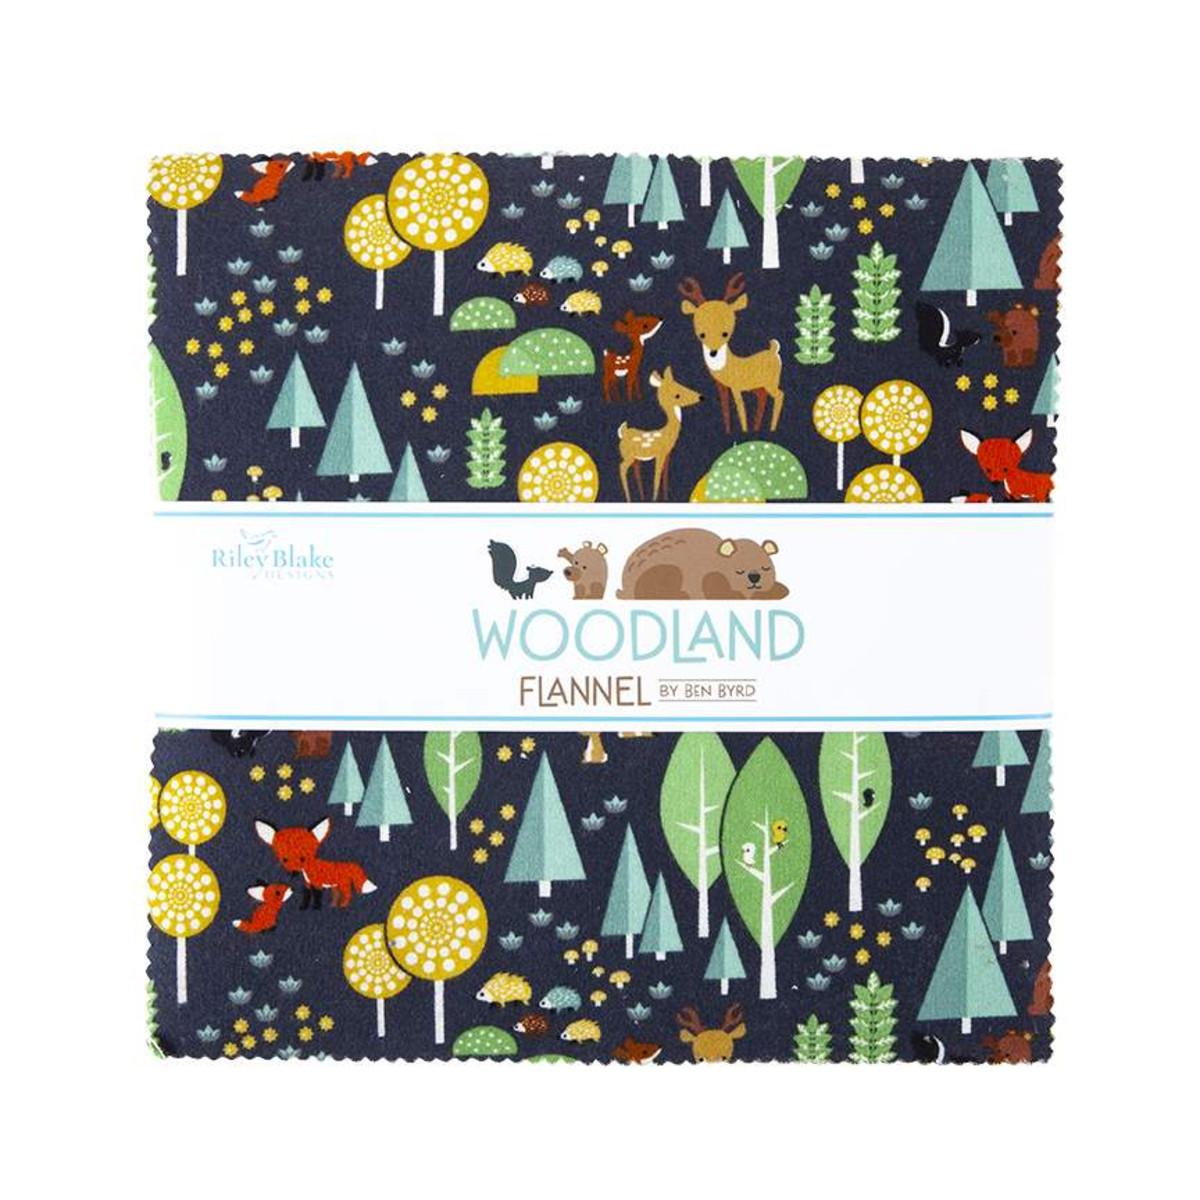 Riley Blake Layer Cake - Woodland Flannel by Ben Byrd